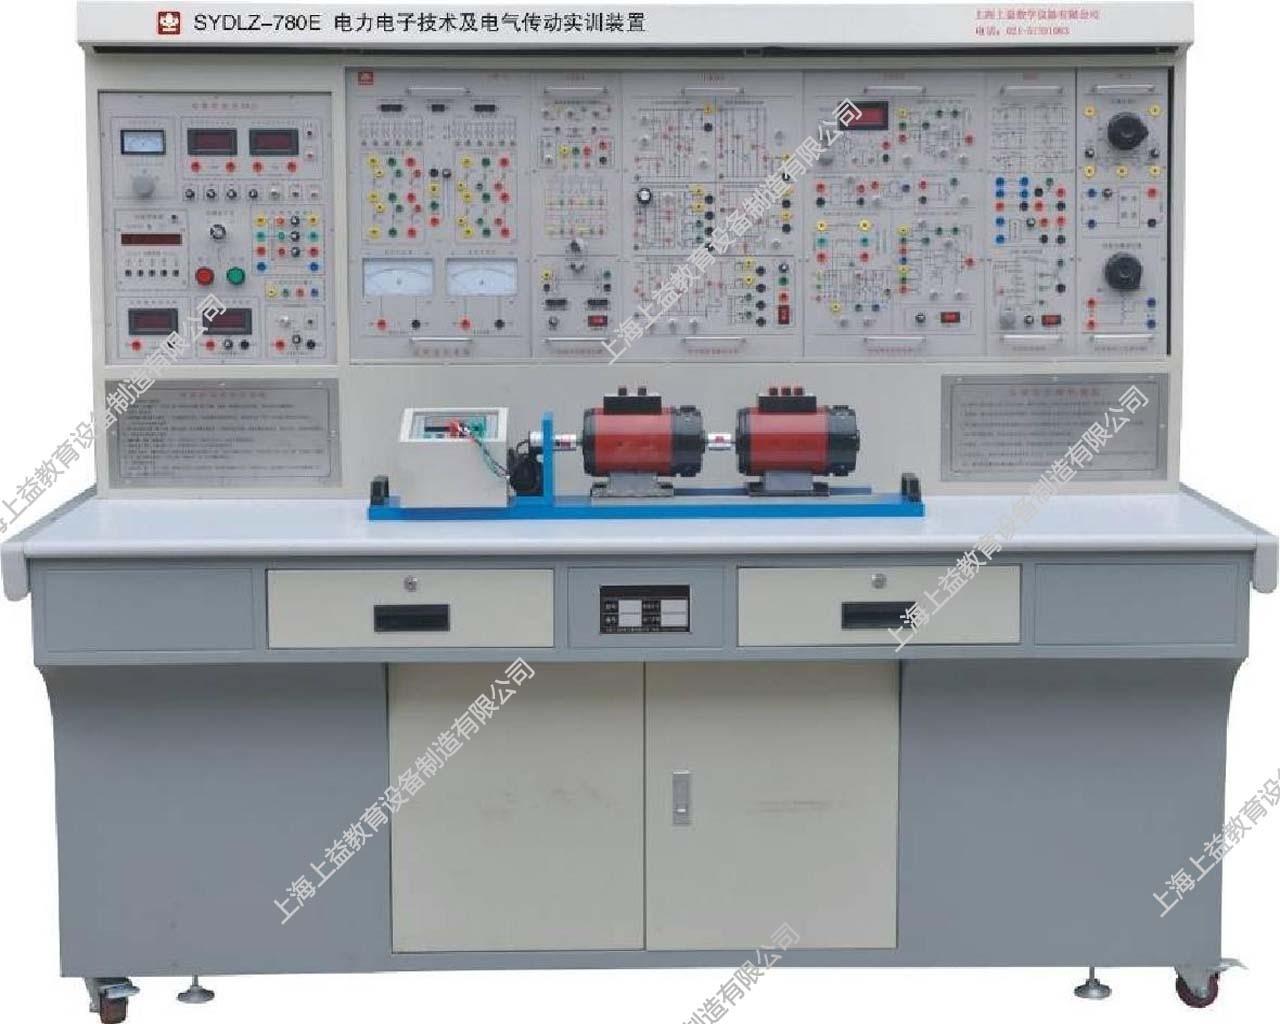 SYDLZ-780E电力电子技术及电气传动wwwlehu8vip装置